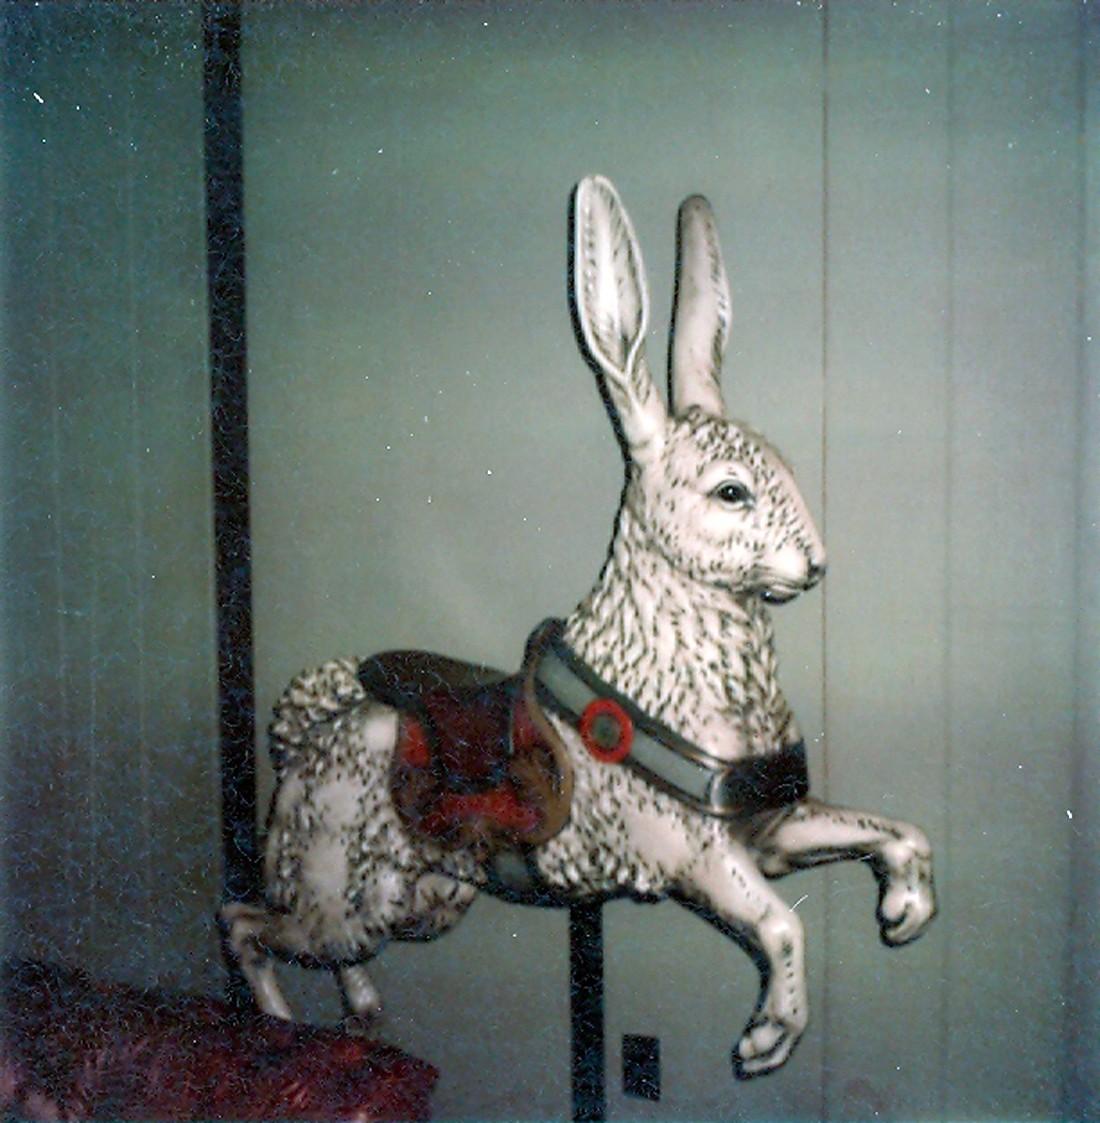 Fraley-Redbug-Studio-carousel-horse-restoration-1980-Dentzel-rabbit